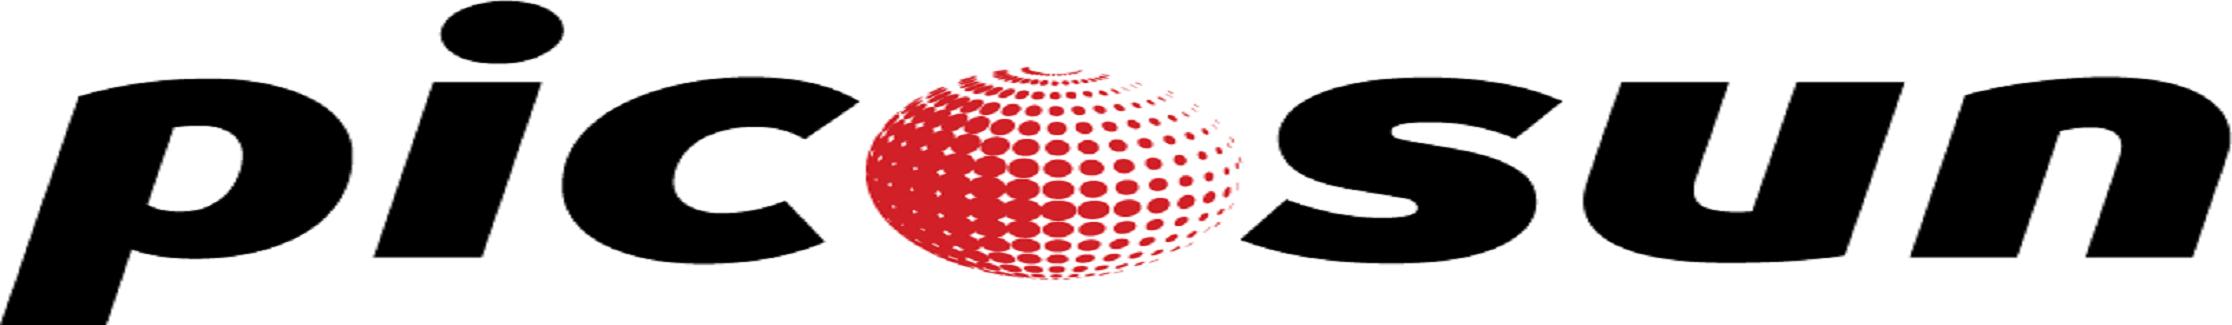 Picosun Logo RGB, זייס ישראל, zeiss ישראל, מנדפים כימיים, molecular layer deposition, מנדף כימי נייד